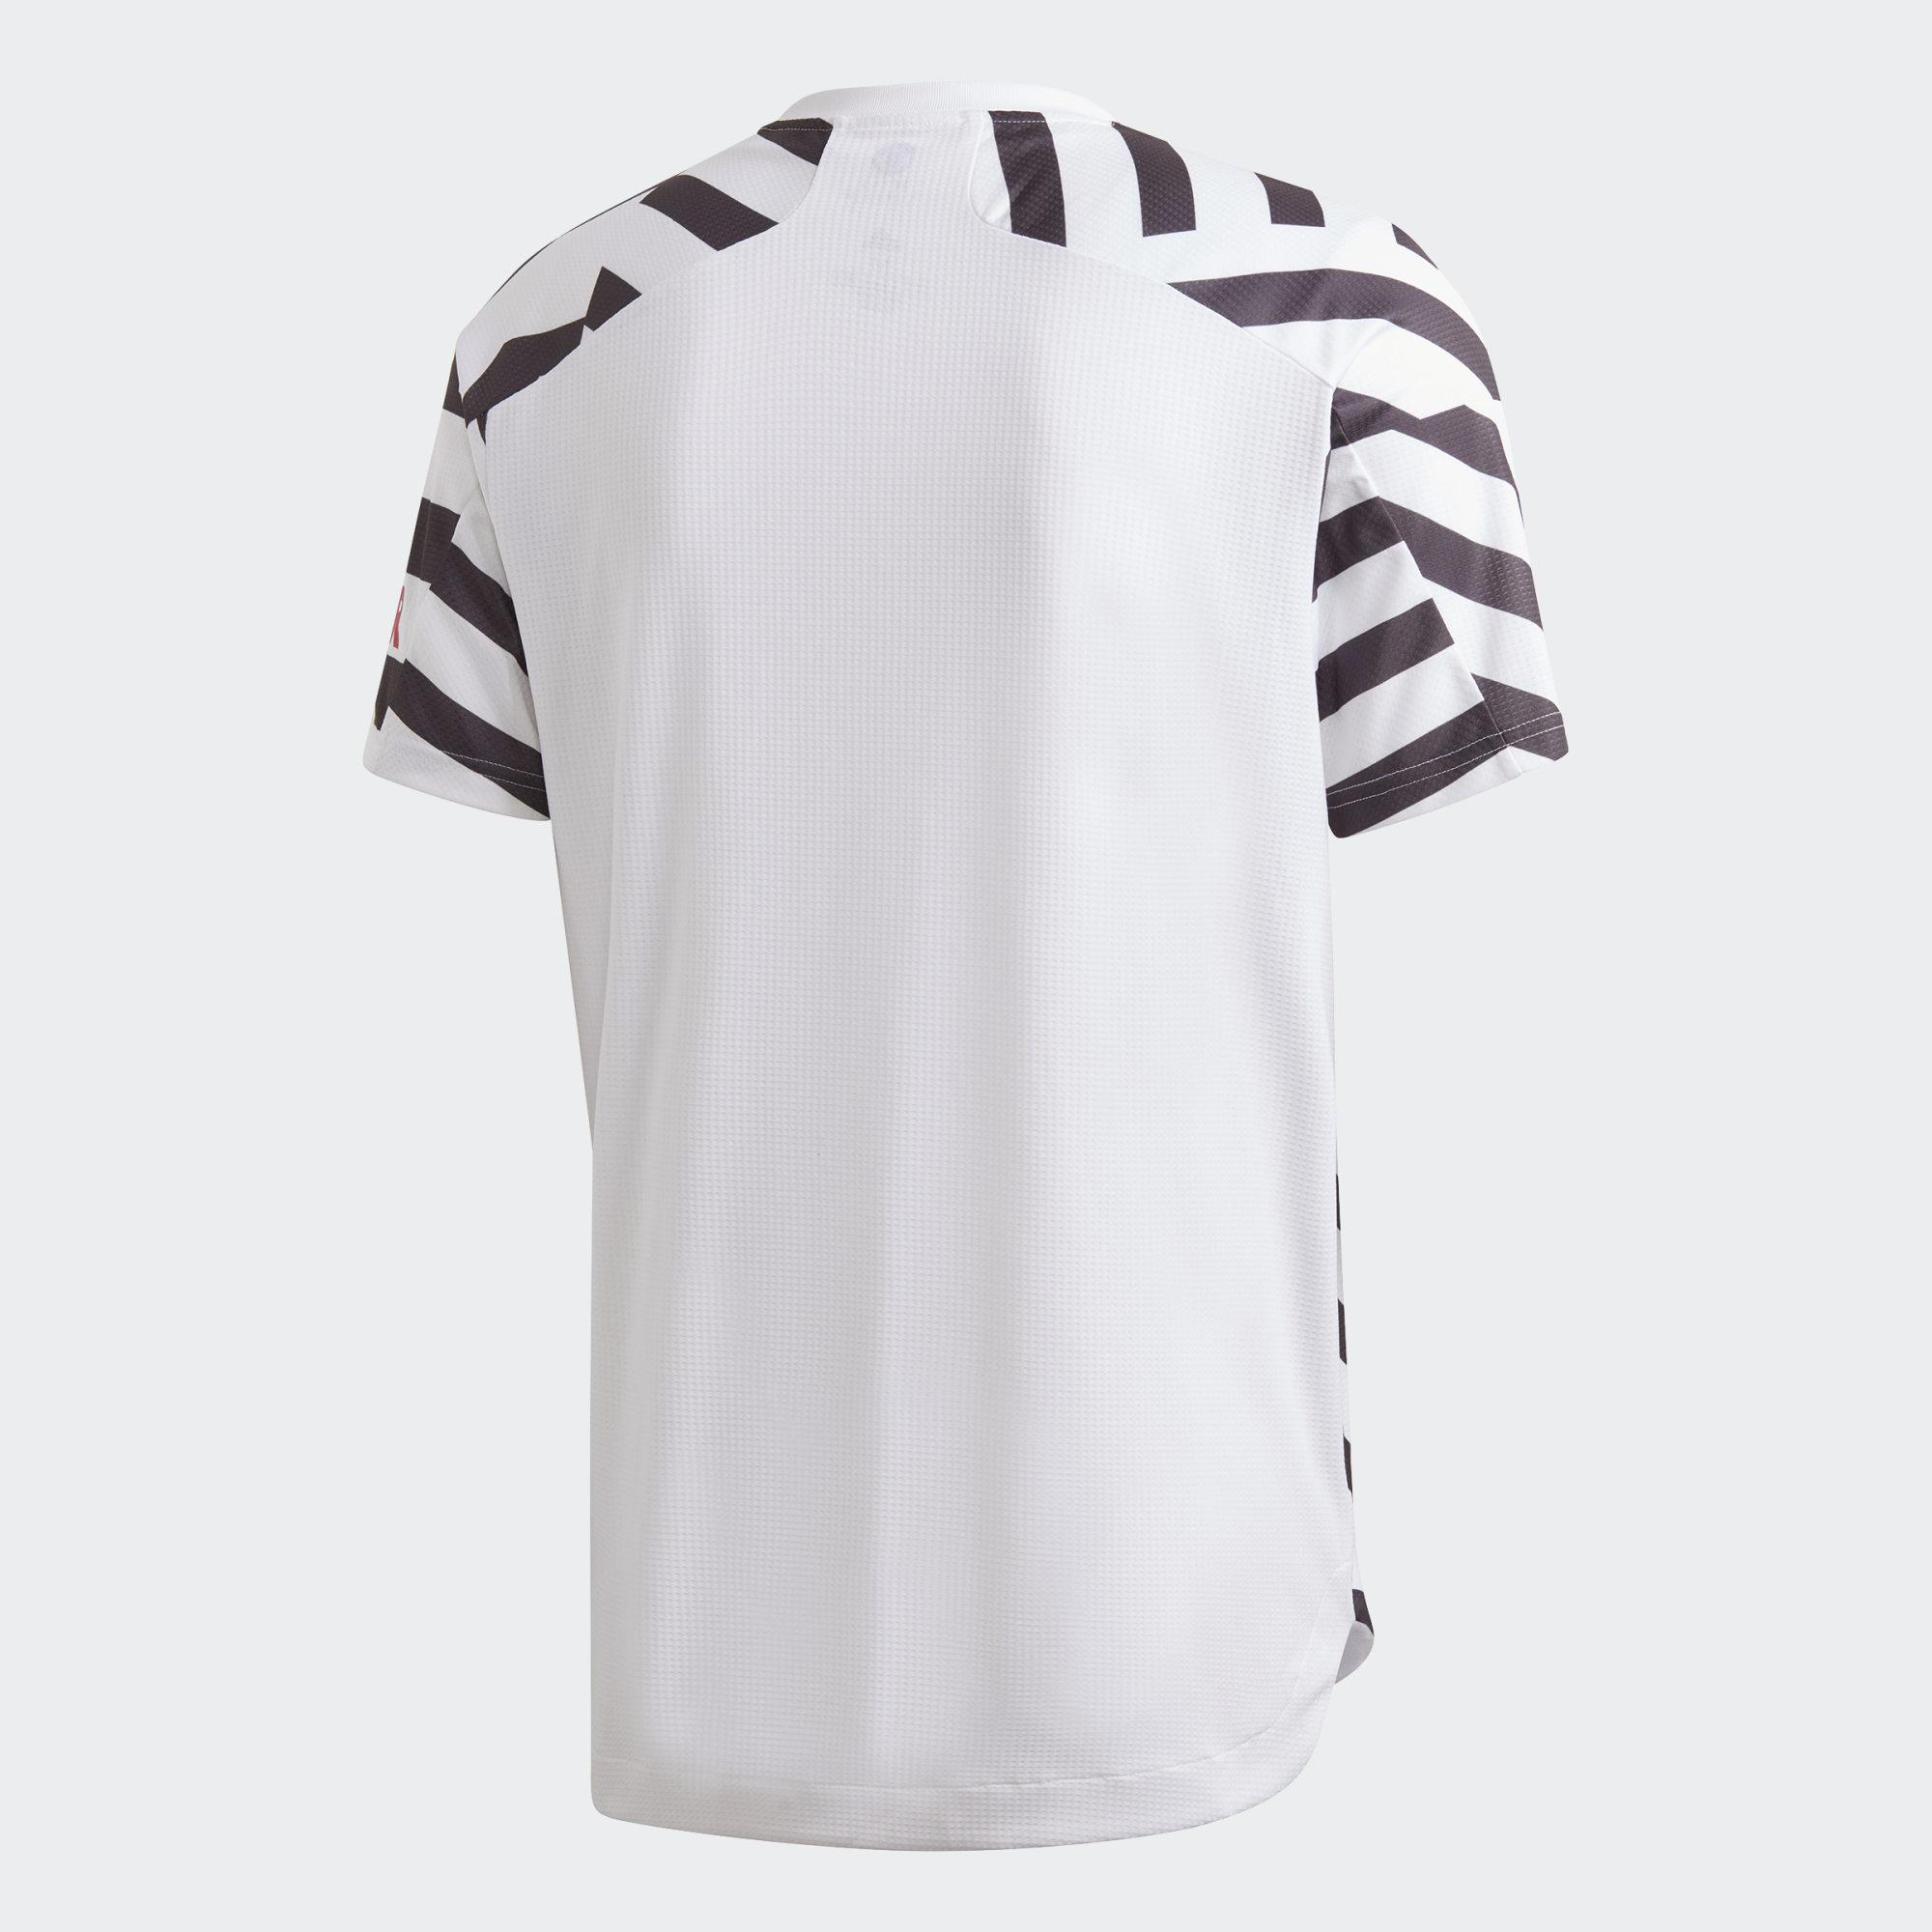 manchester united 2020 21 adidas third kit 20 21 kits football shirt blog manchester united 2020 21 adidas third